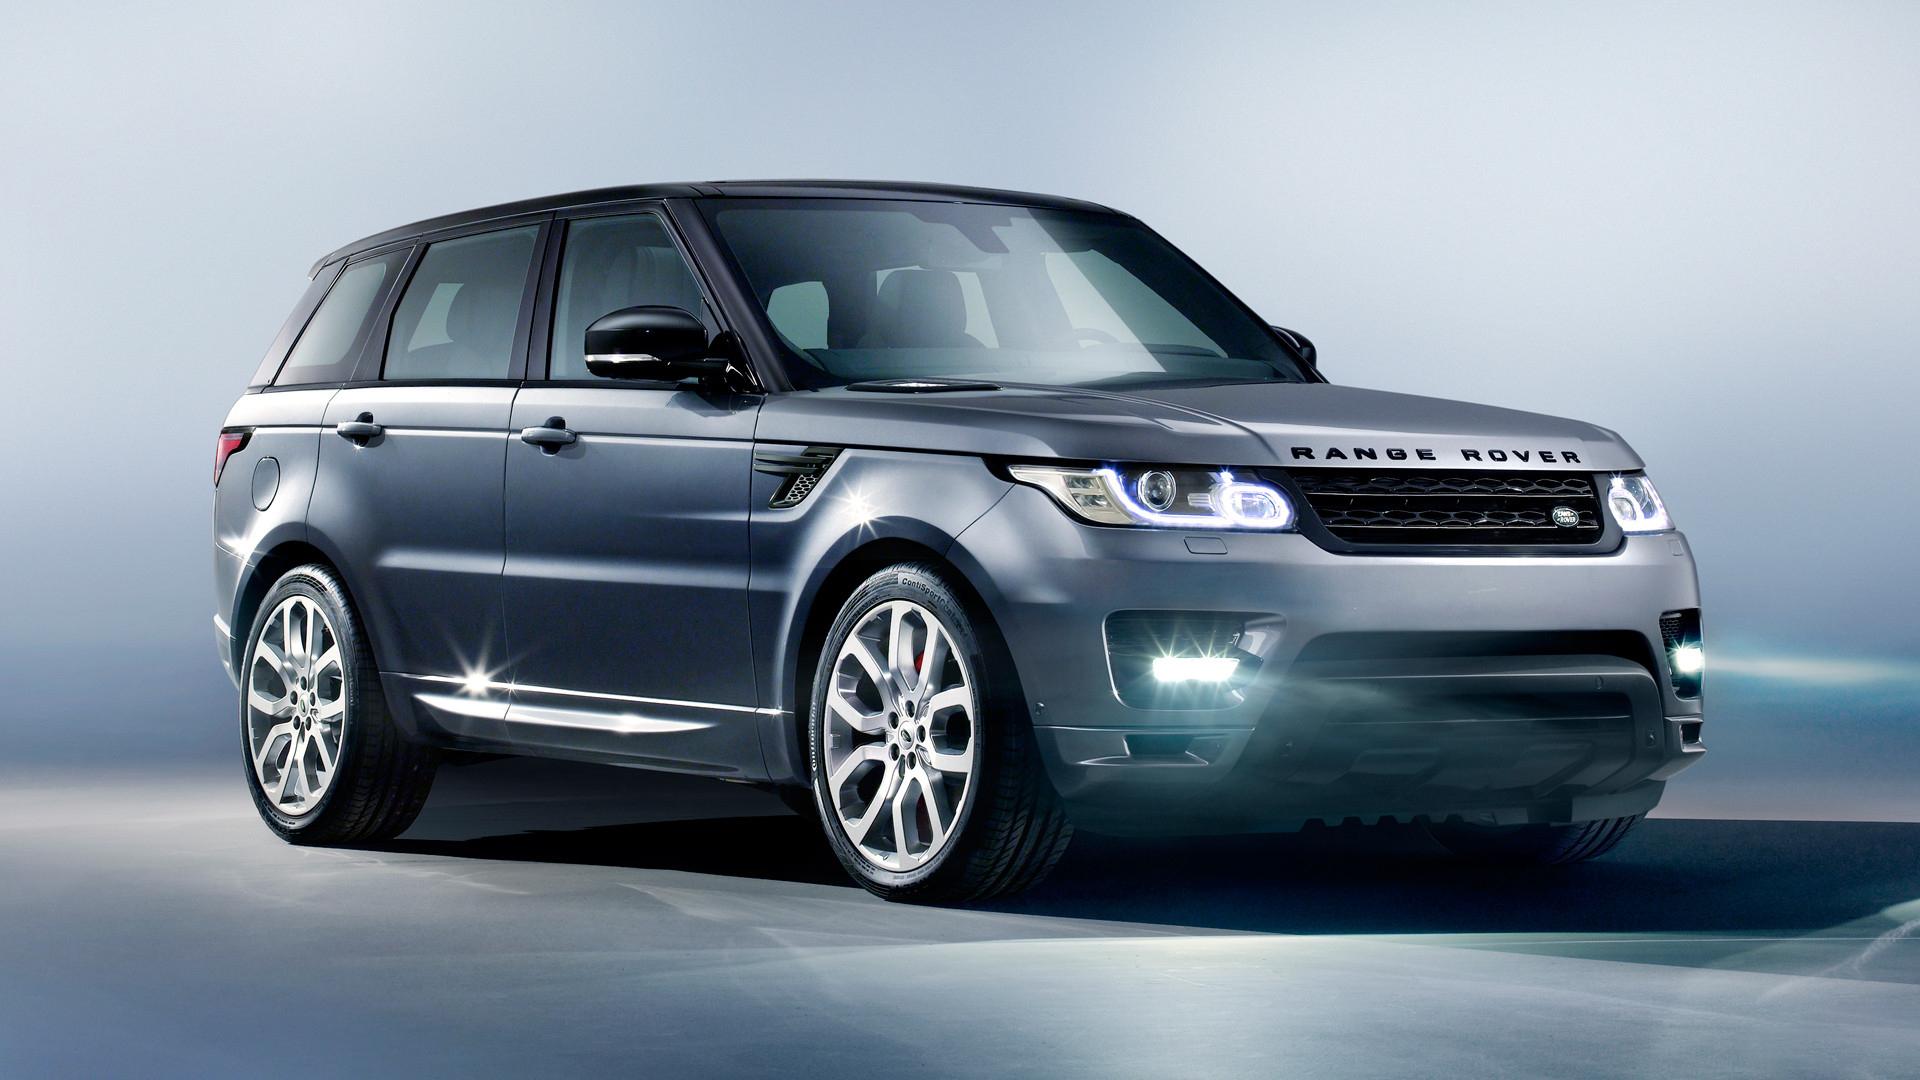 Range Rover Sport – Miles